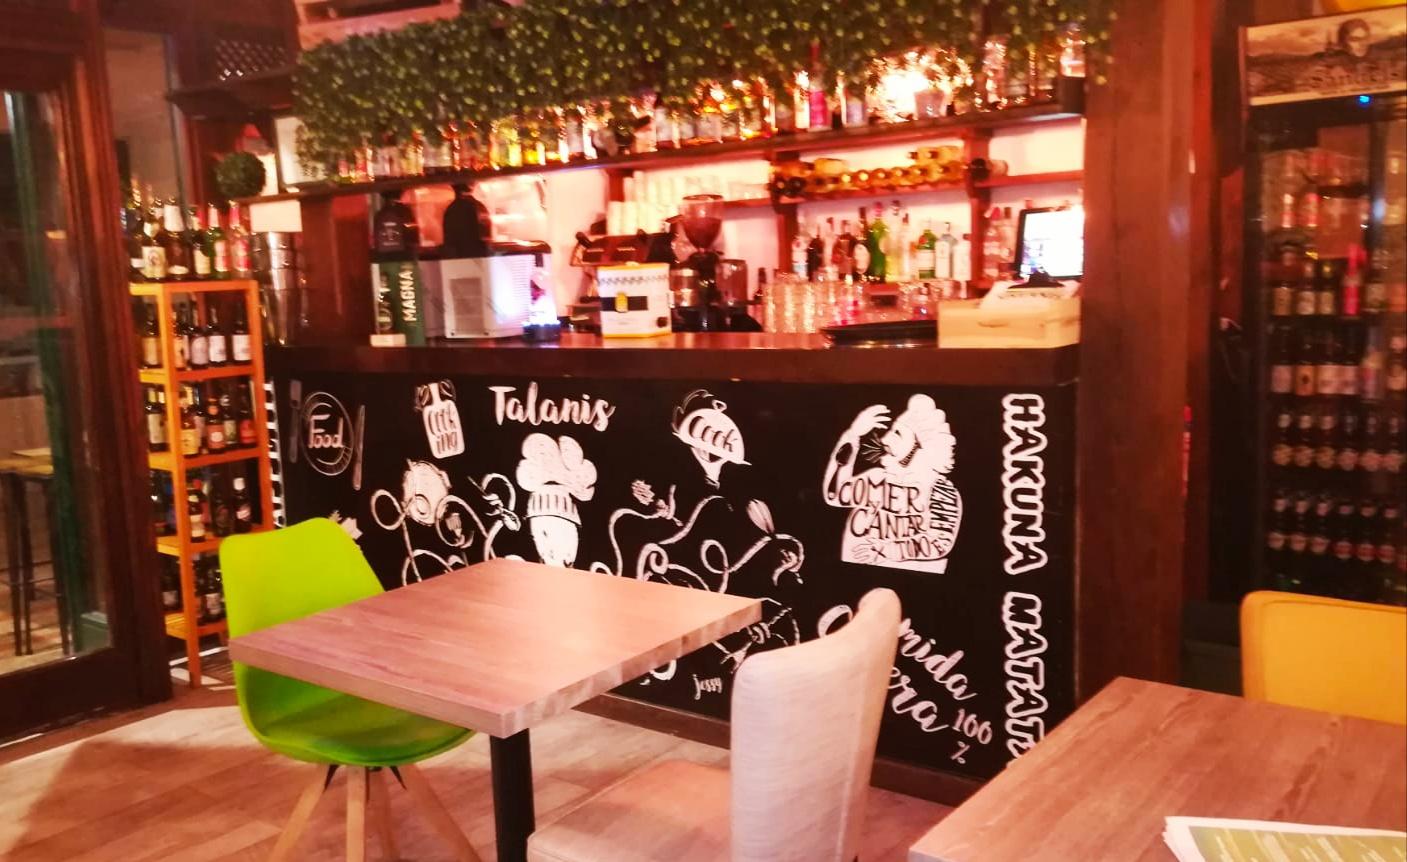 Restaurante Talanis